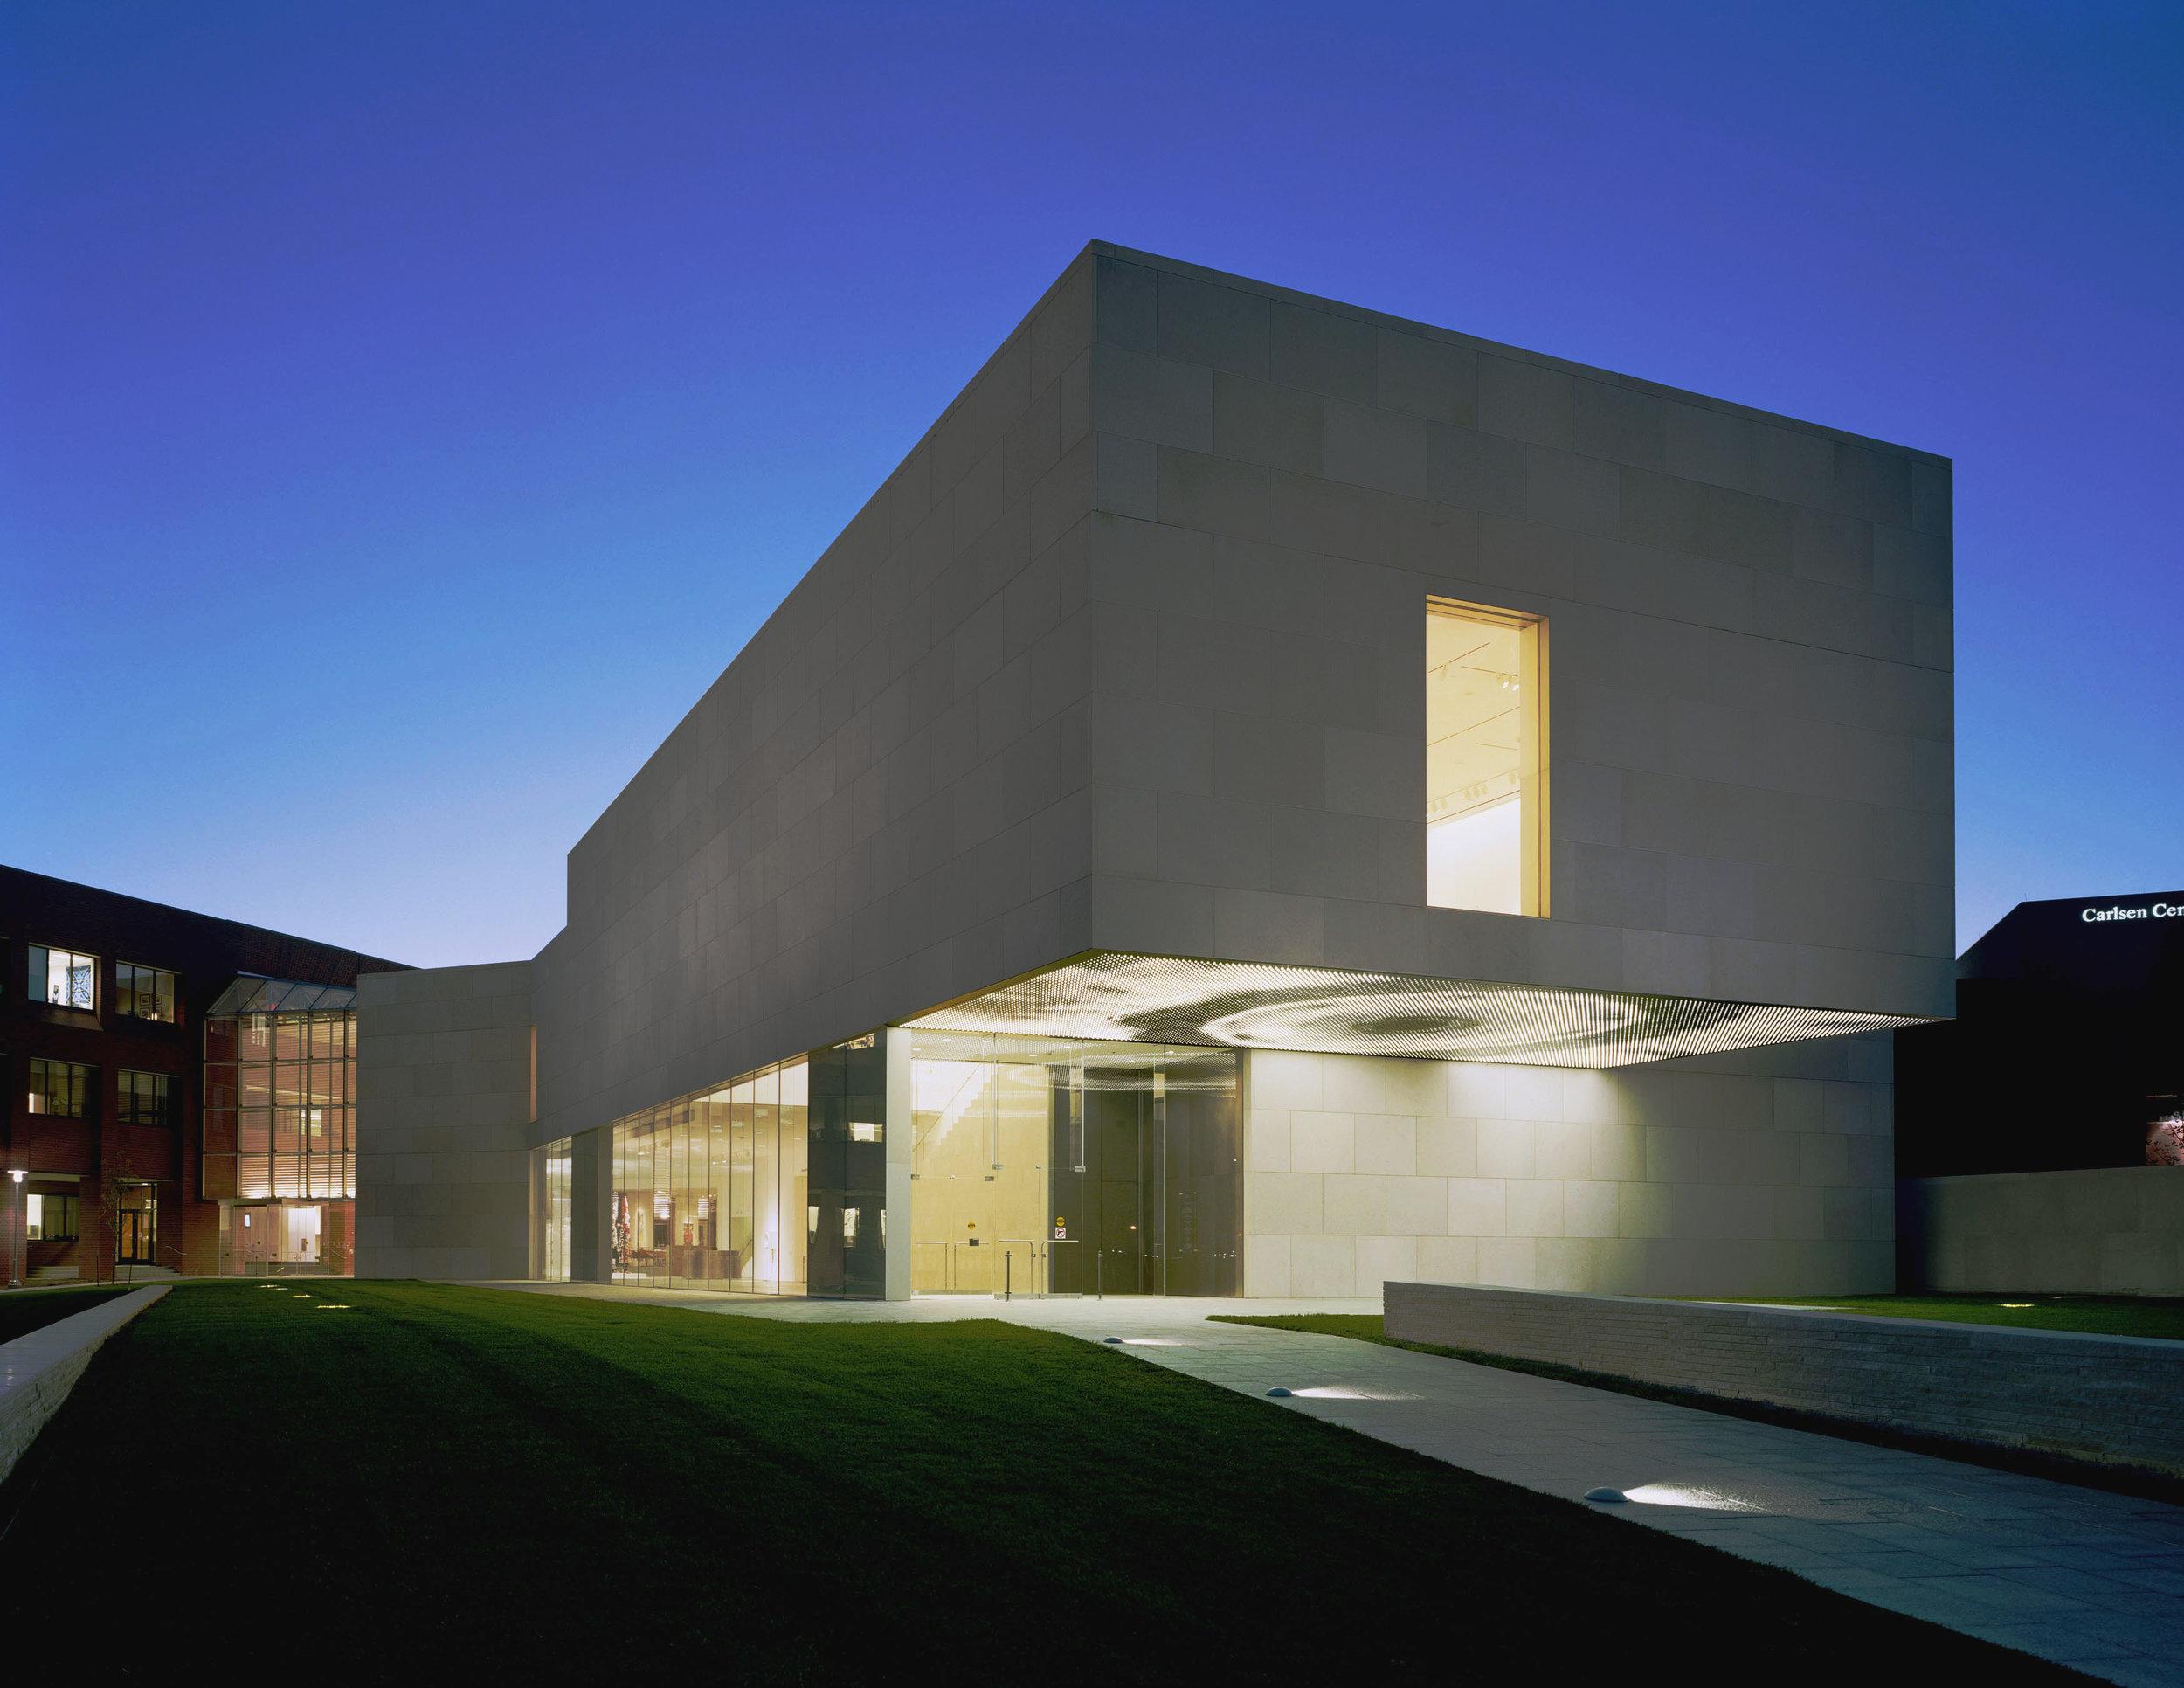 Microcosm , 2007  Site-specific installation: Nerman Museum of Contemporary Art, Overland Park, KS